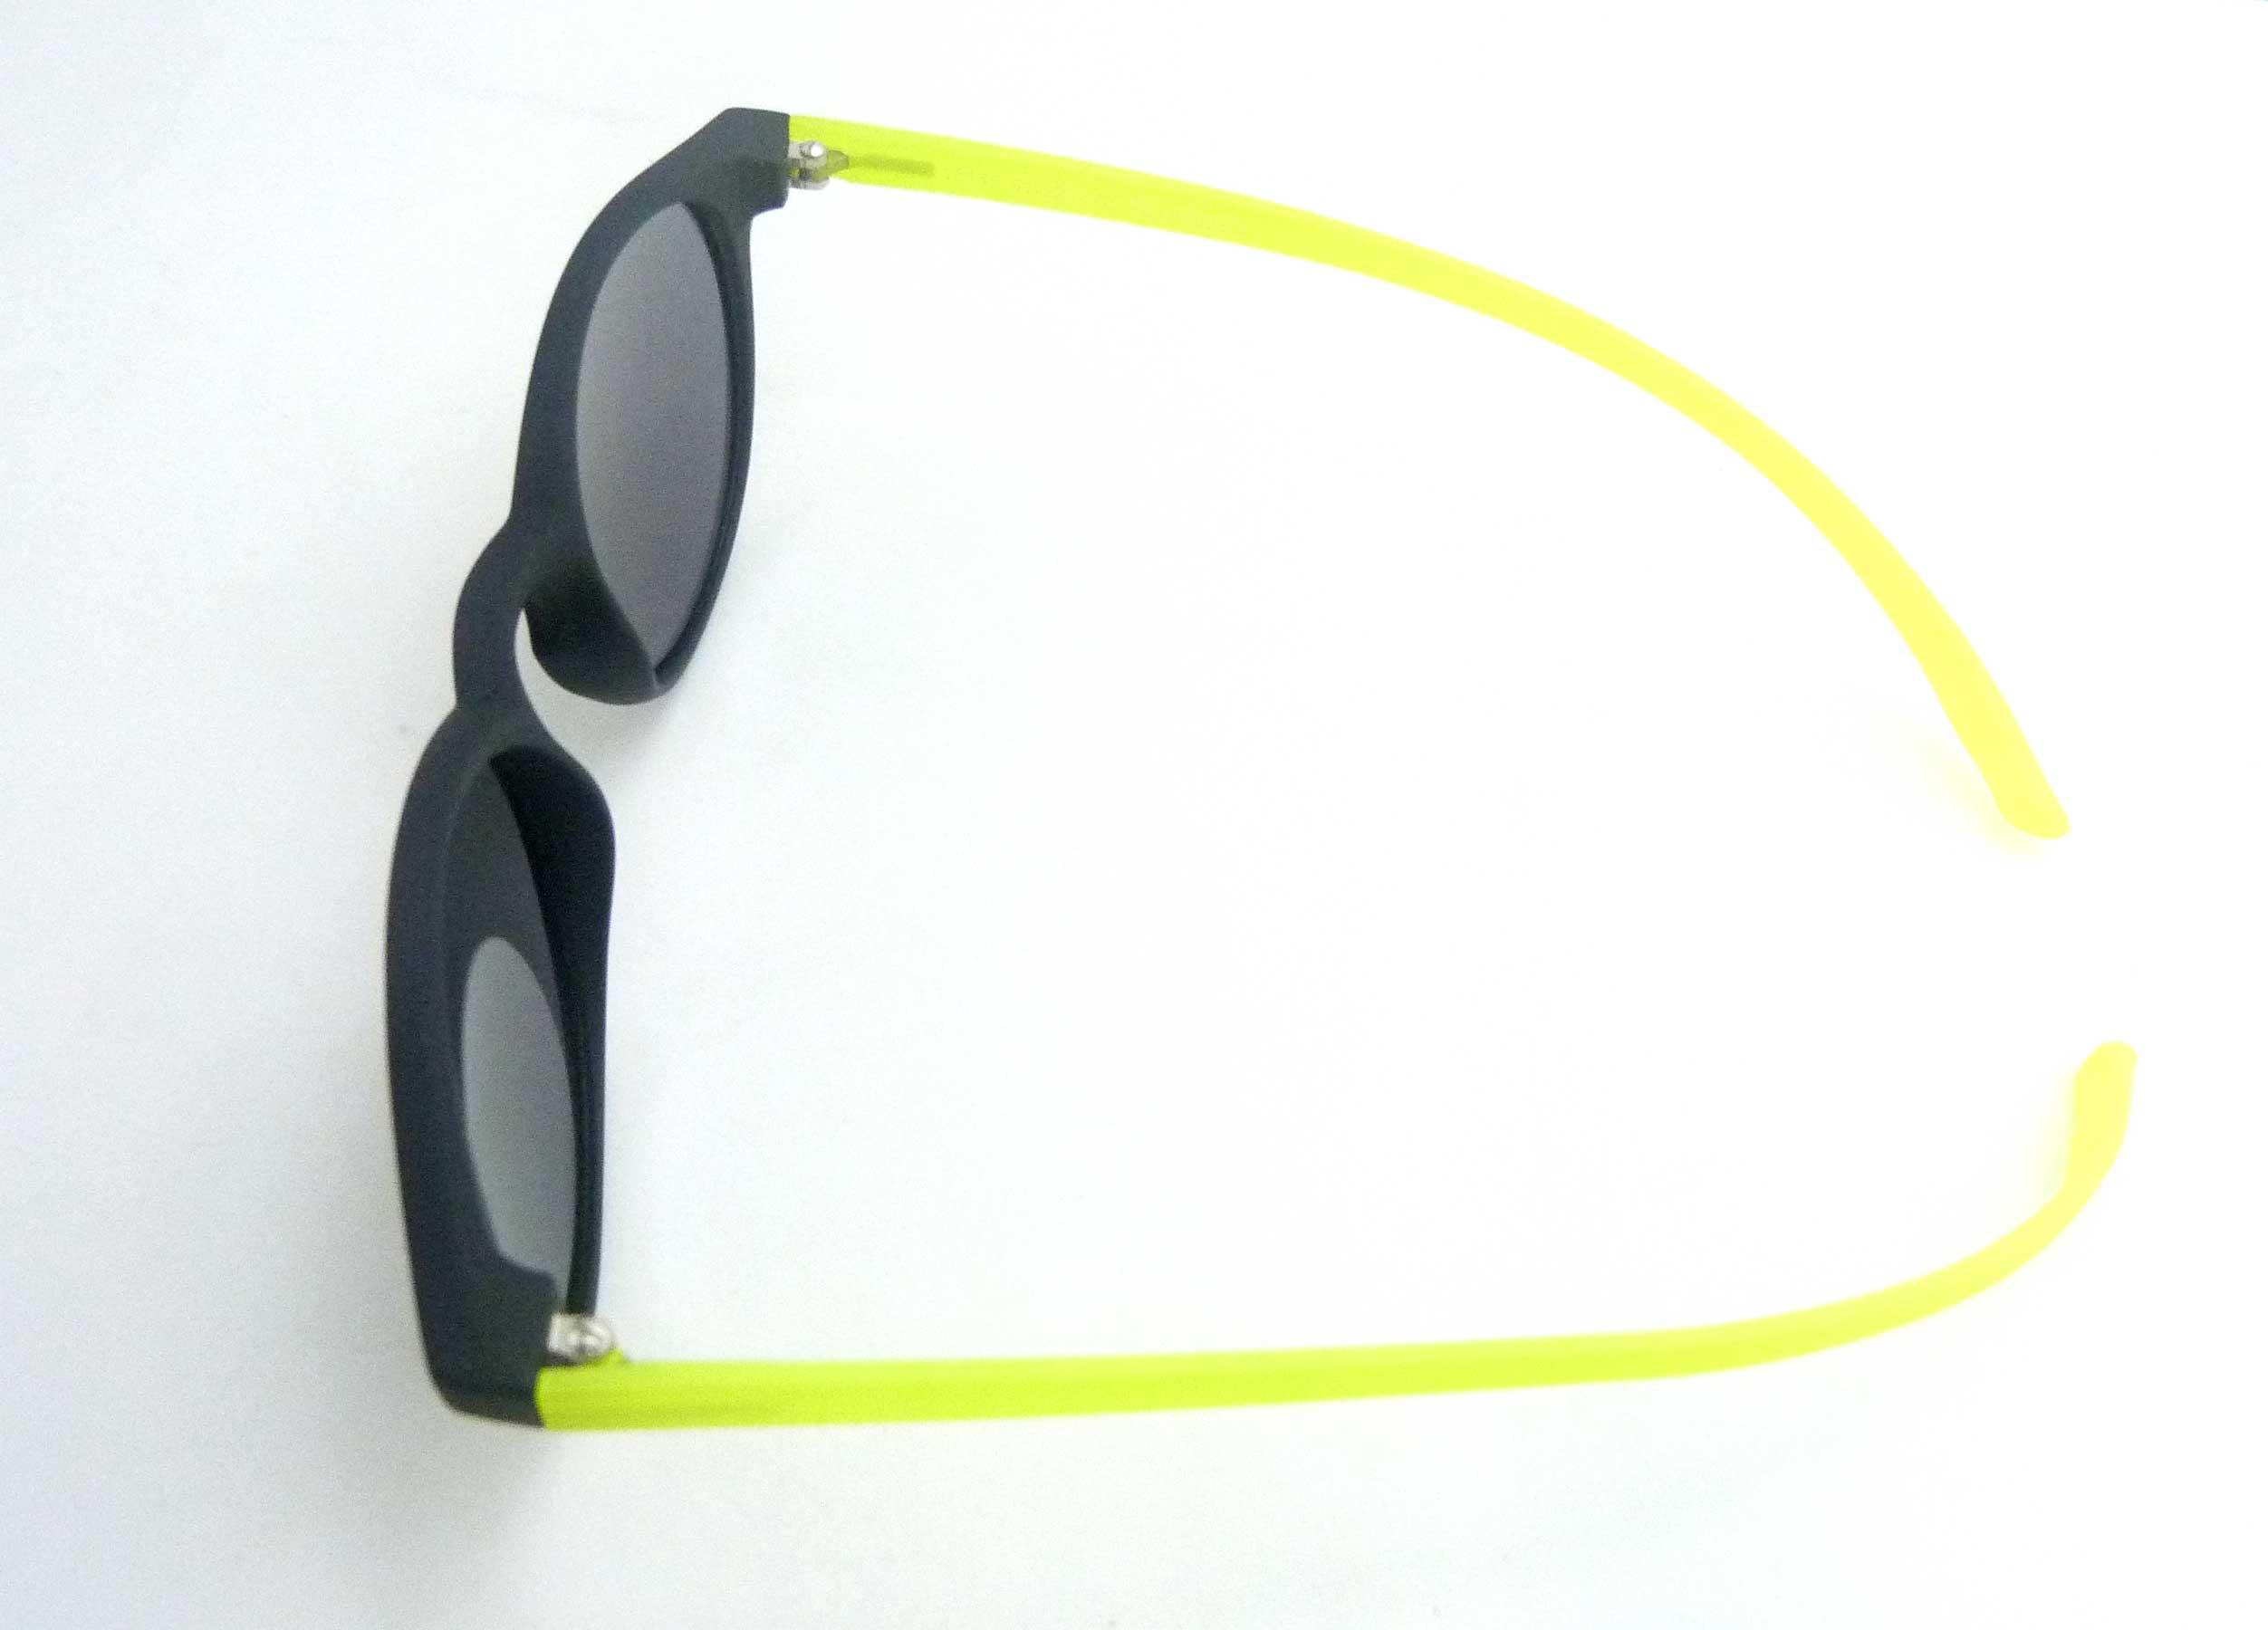 0215095 - Óculos-Solar CS Koala 52x17 Preto/Verde Mod 15095 FLAG 9 - Contém 1 Peça